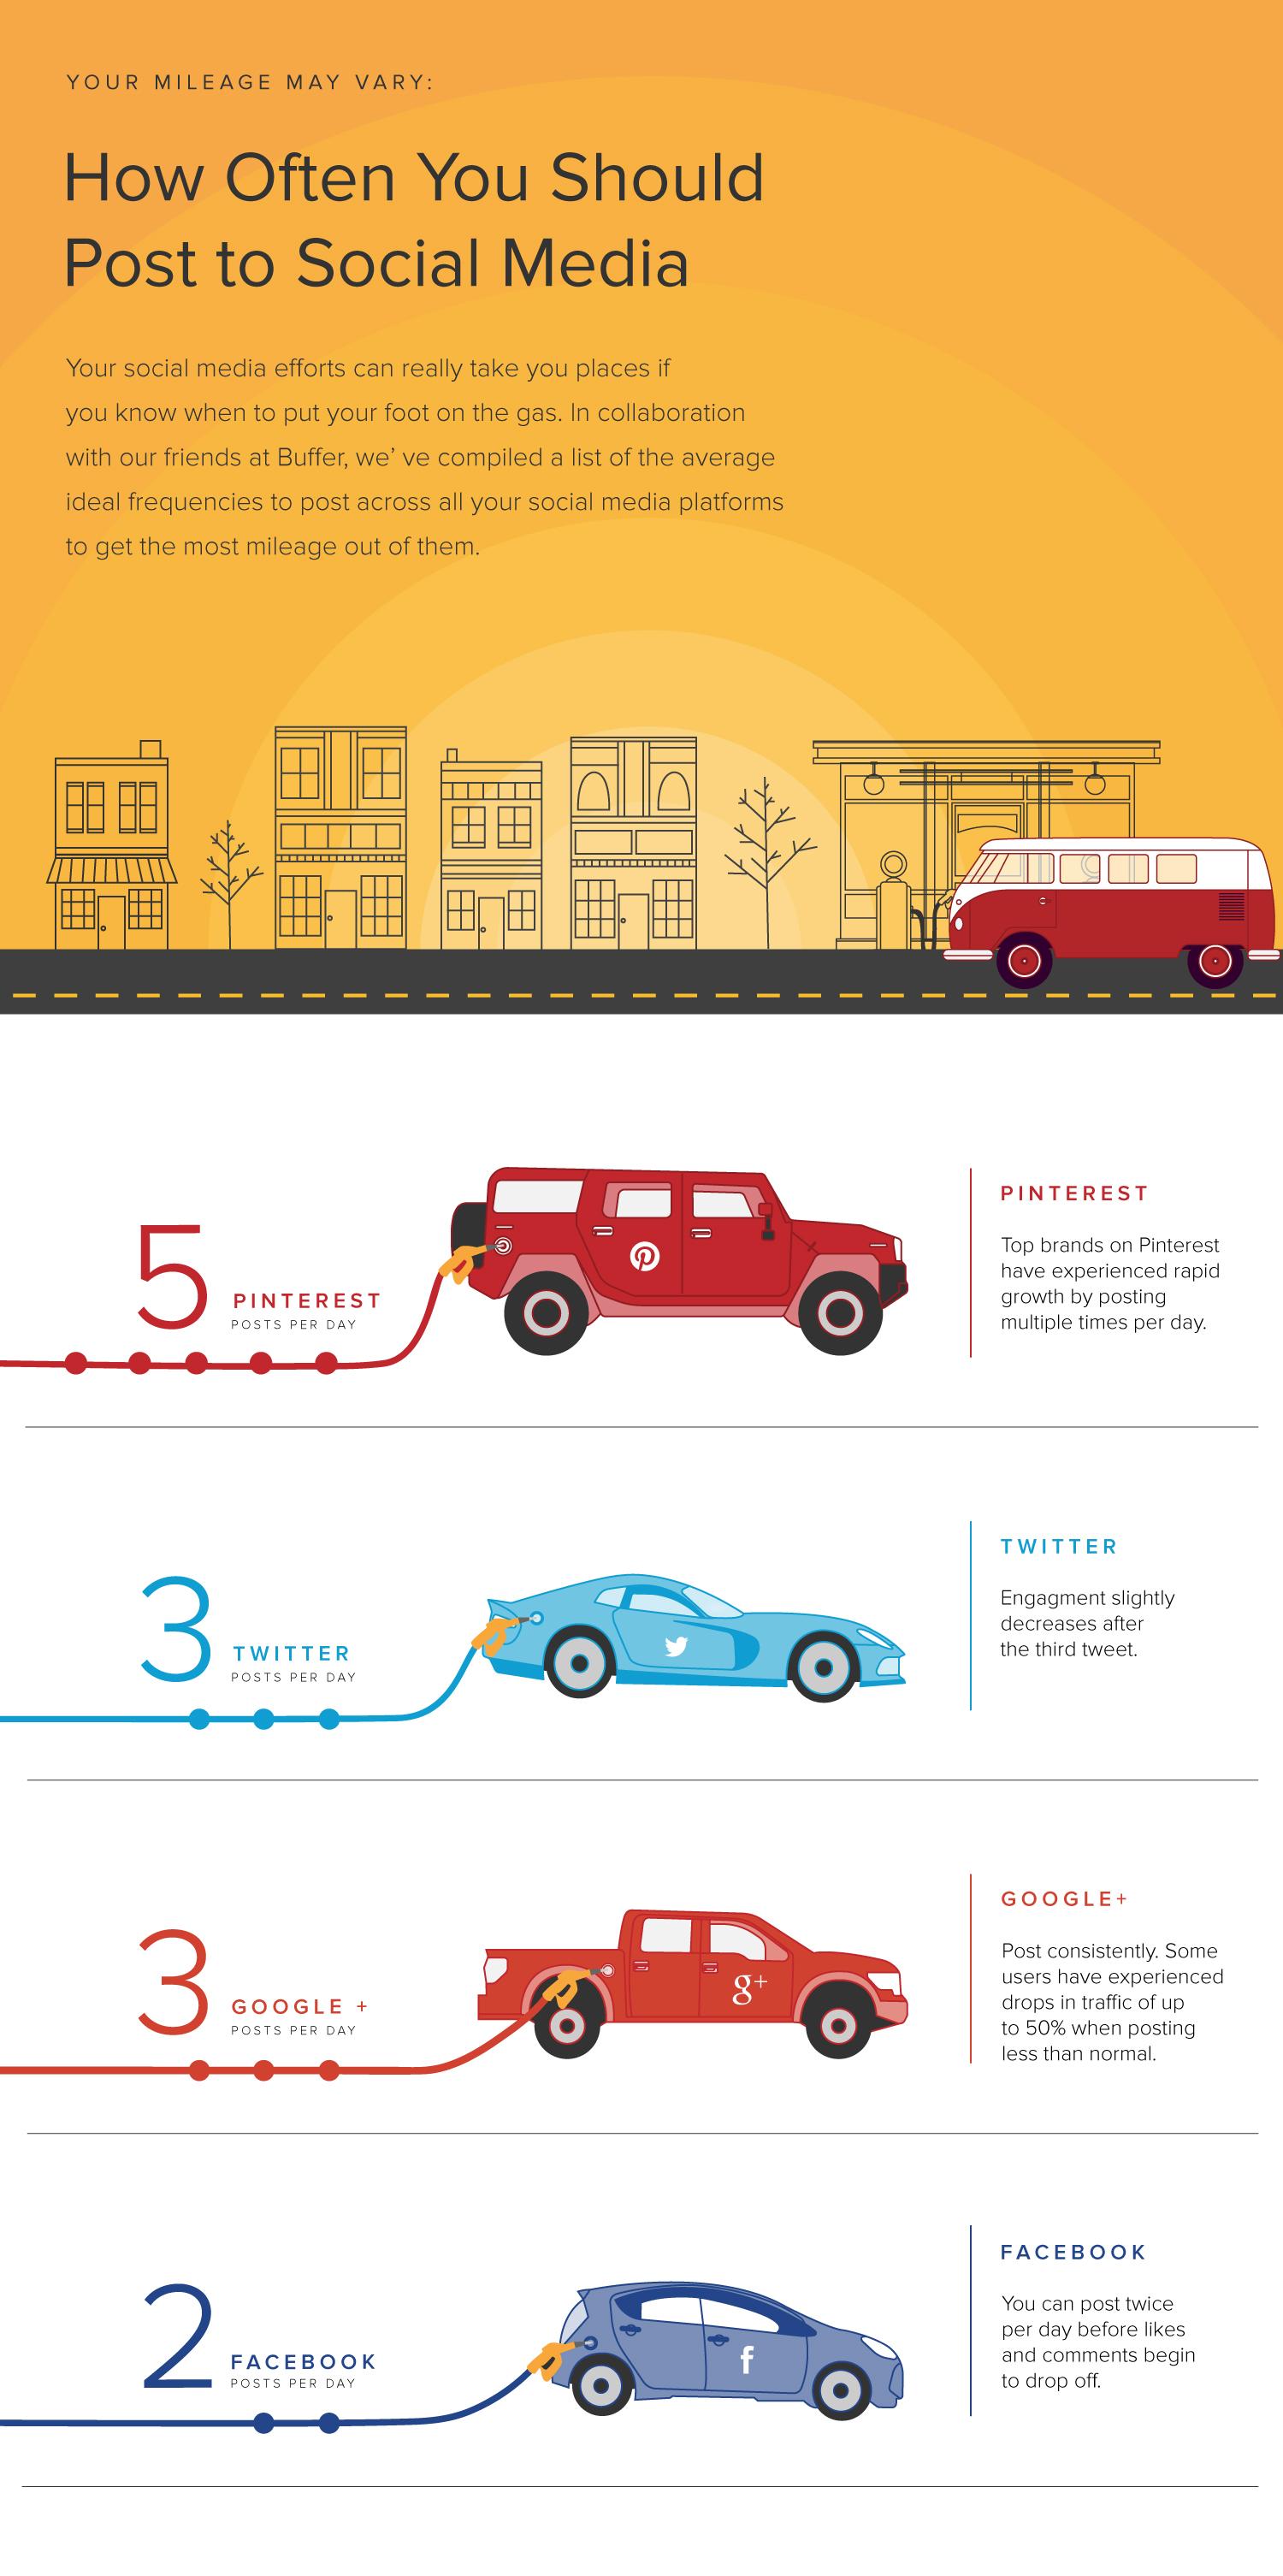 infographic-how-often-to-post-on-social-media